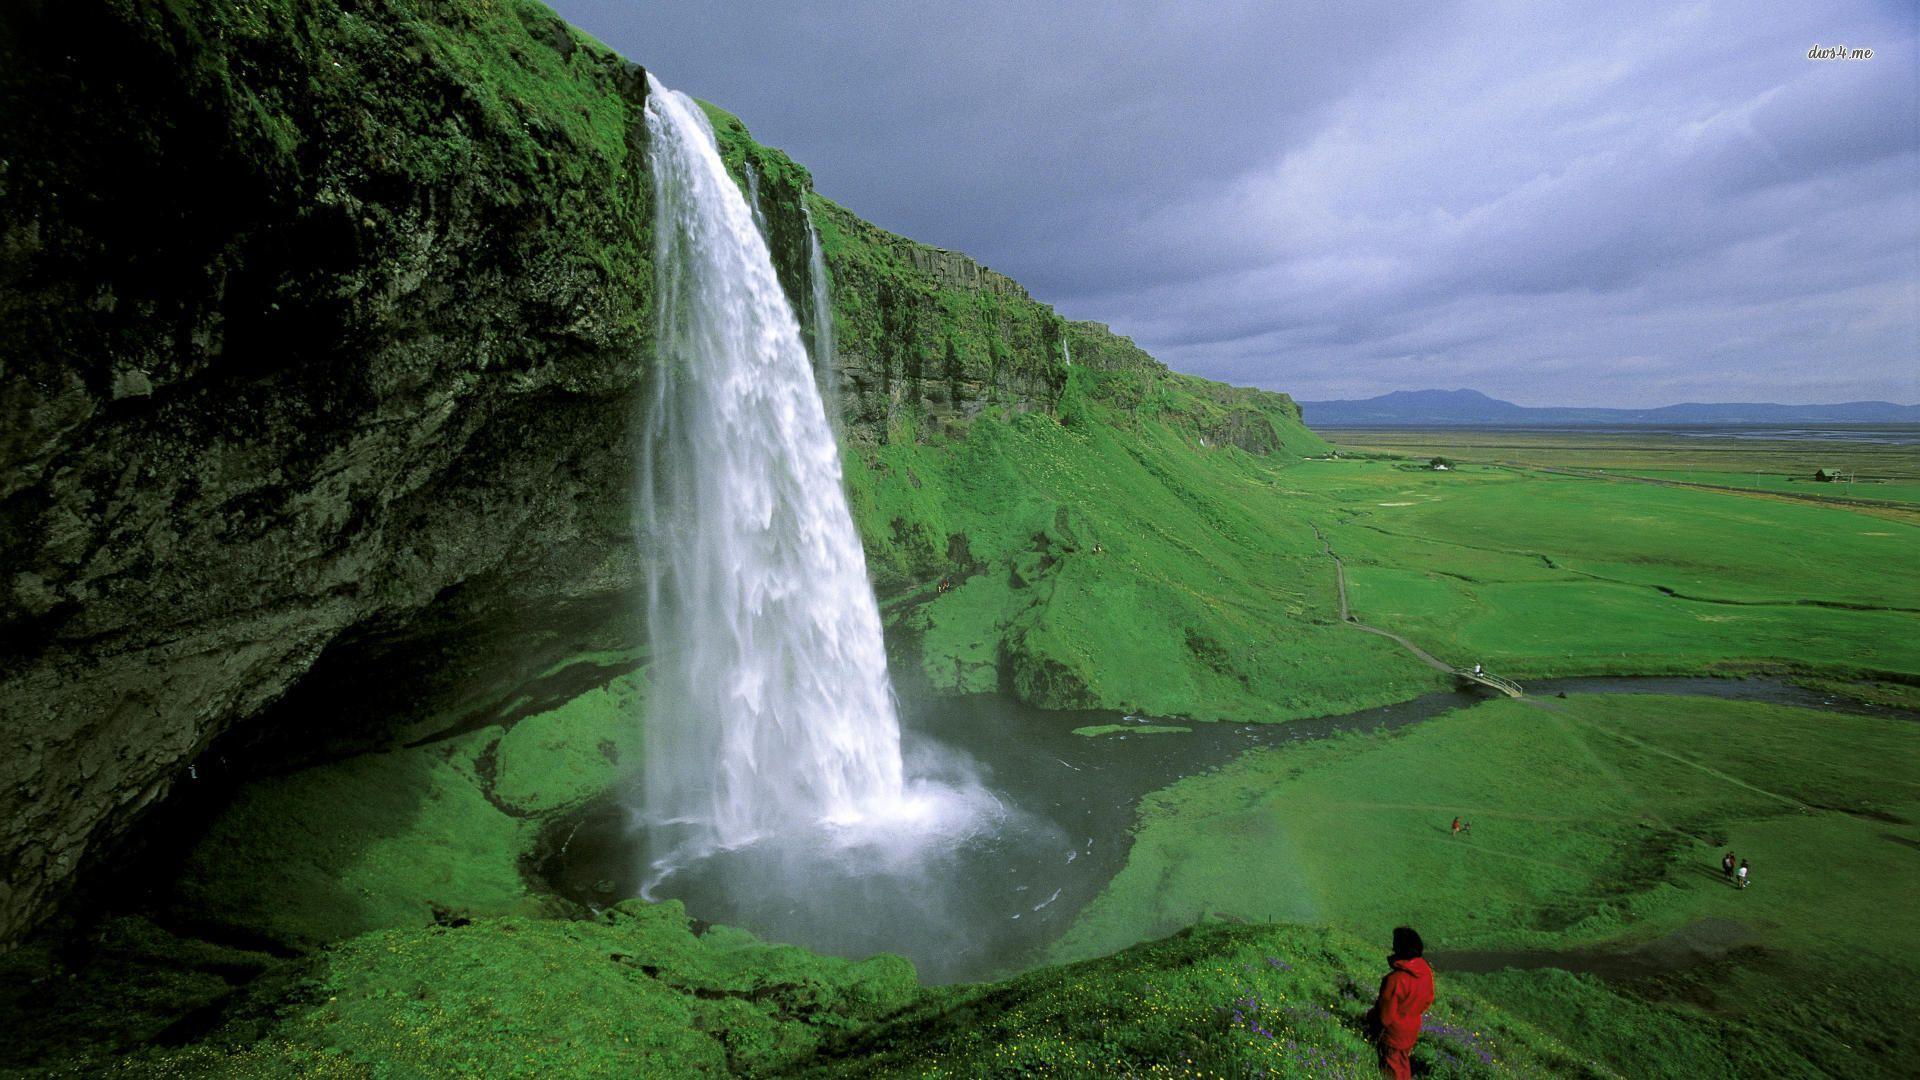 Islande, cascade de Seljalandafoss, verdure, personnes de dos au premier plan